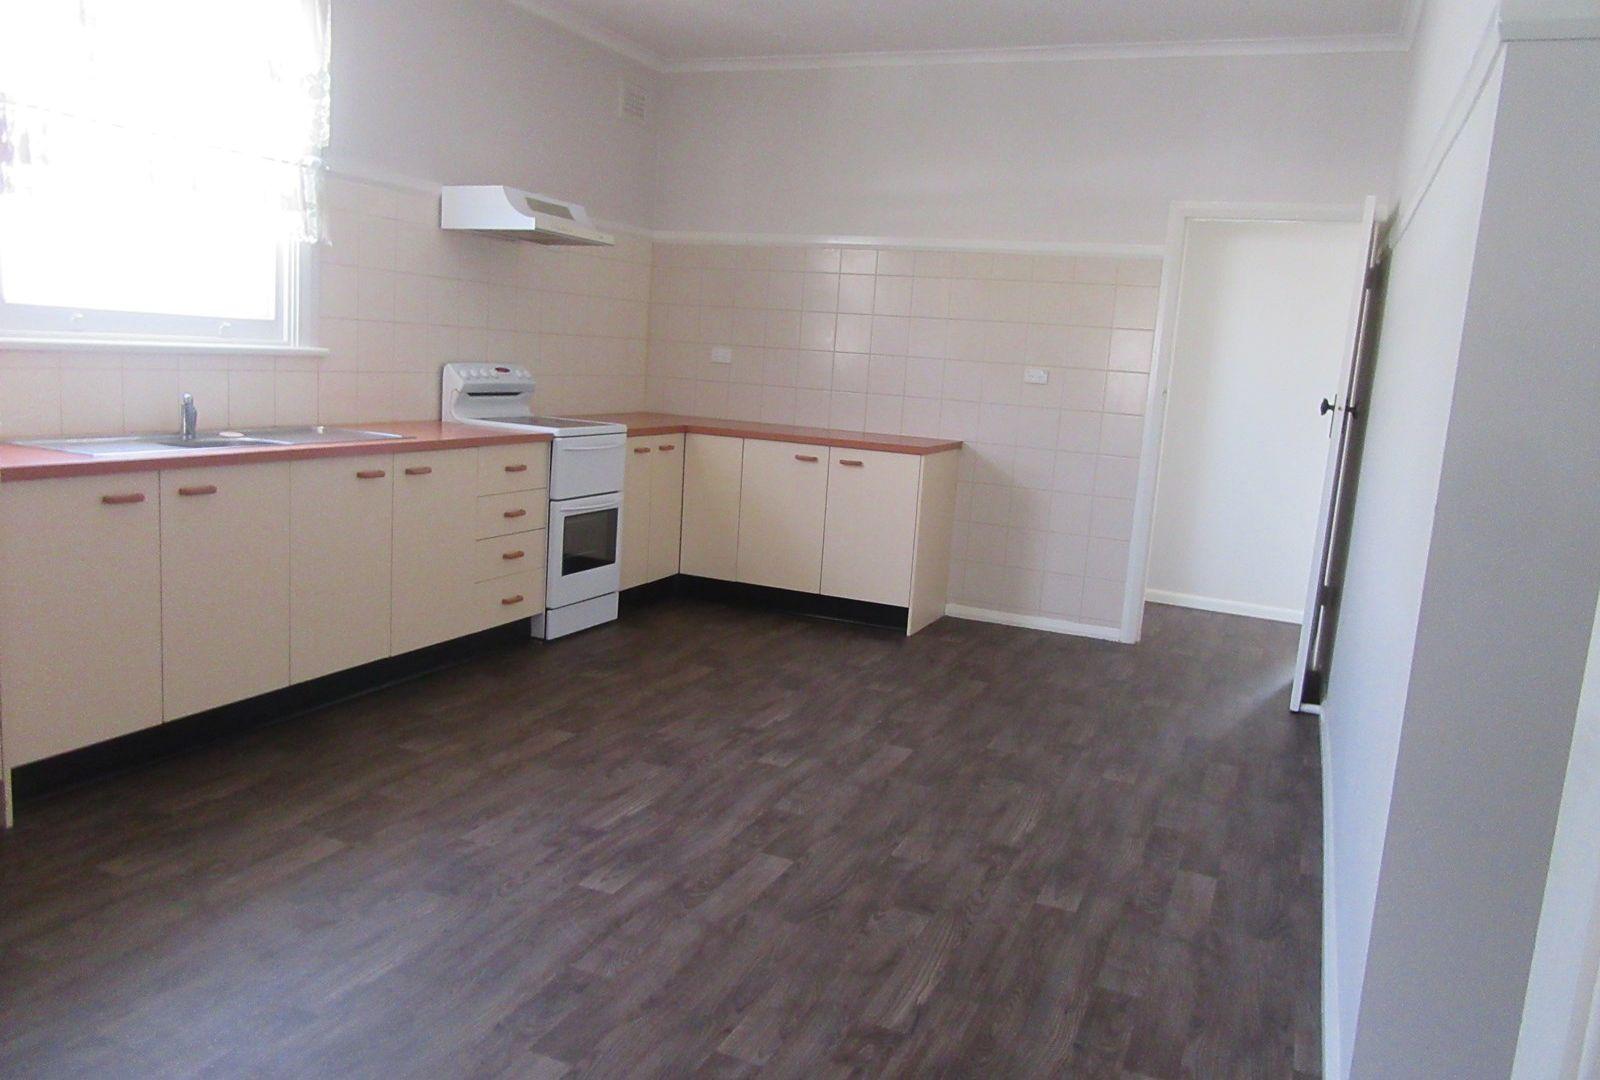 Mudgee NSW 2850, Image 2